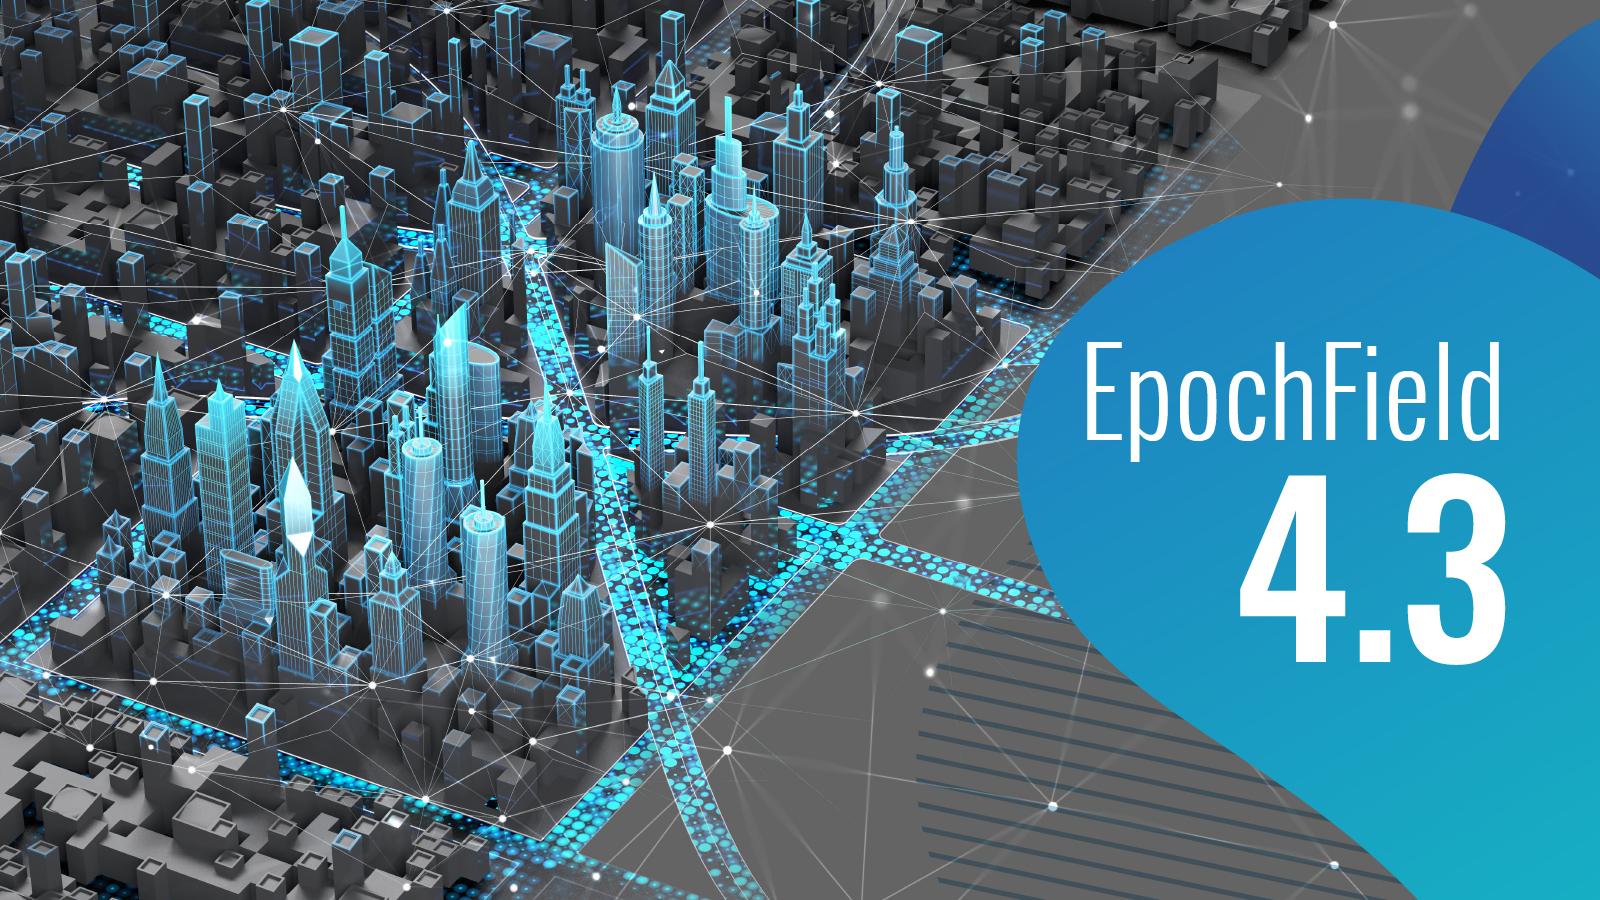 Announcing EpochField 4.3